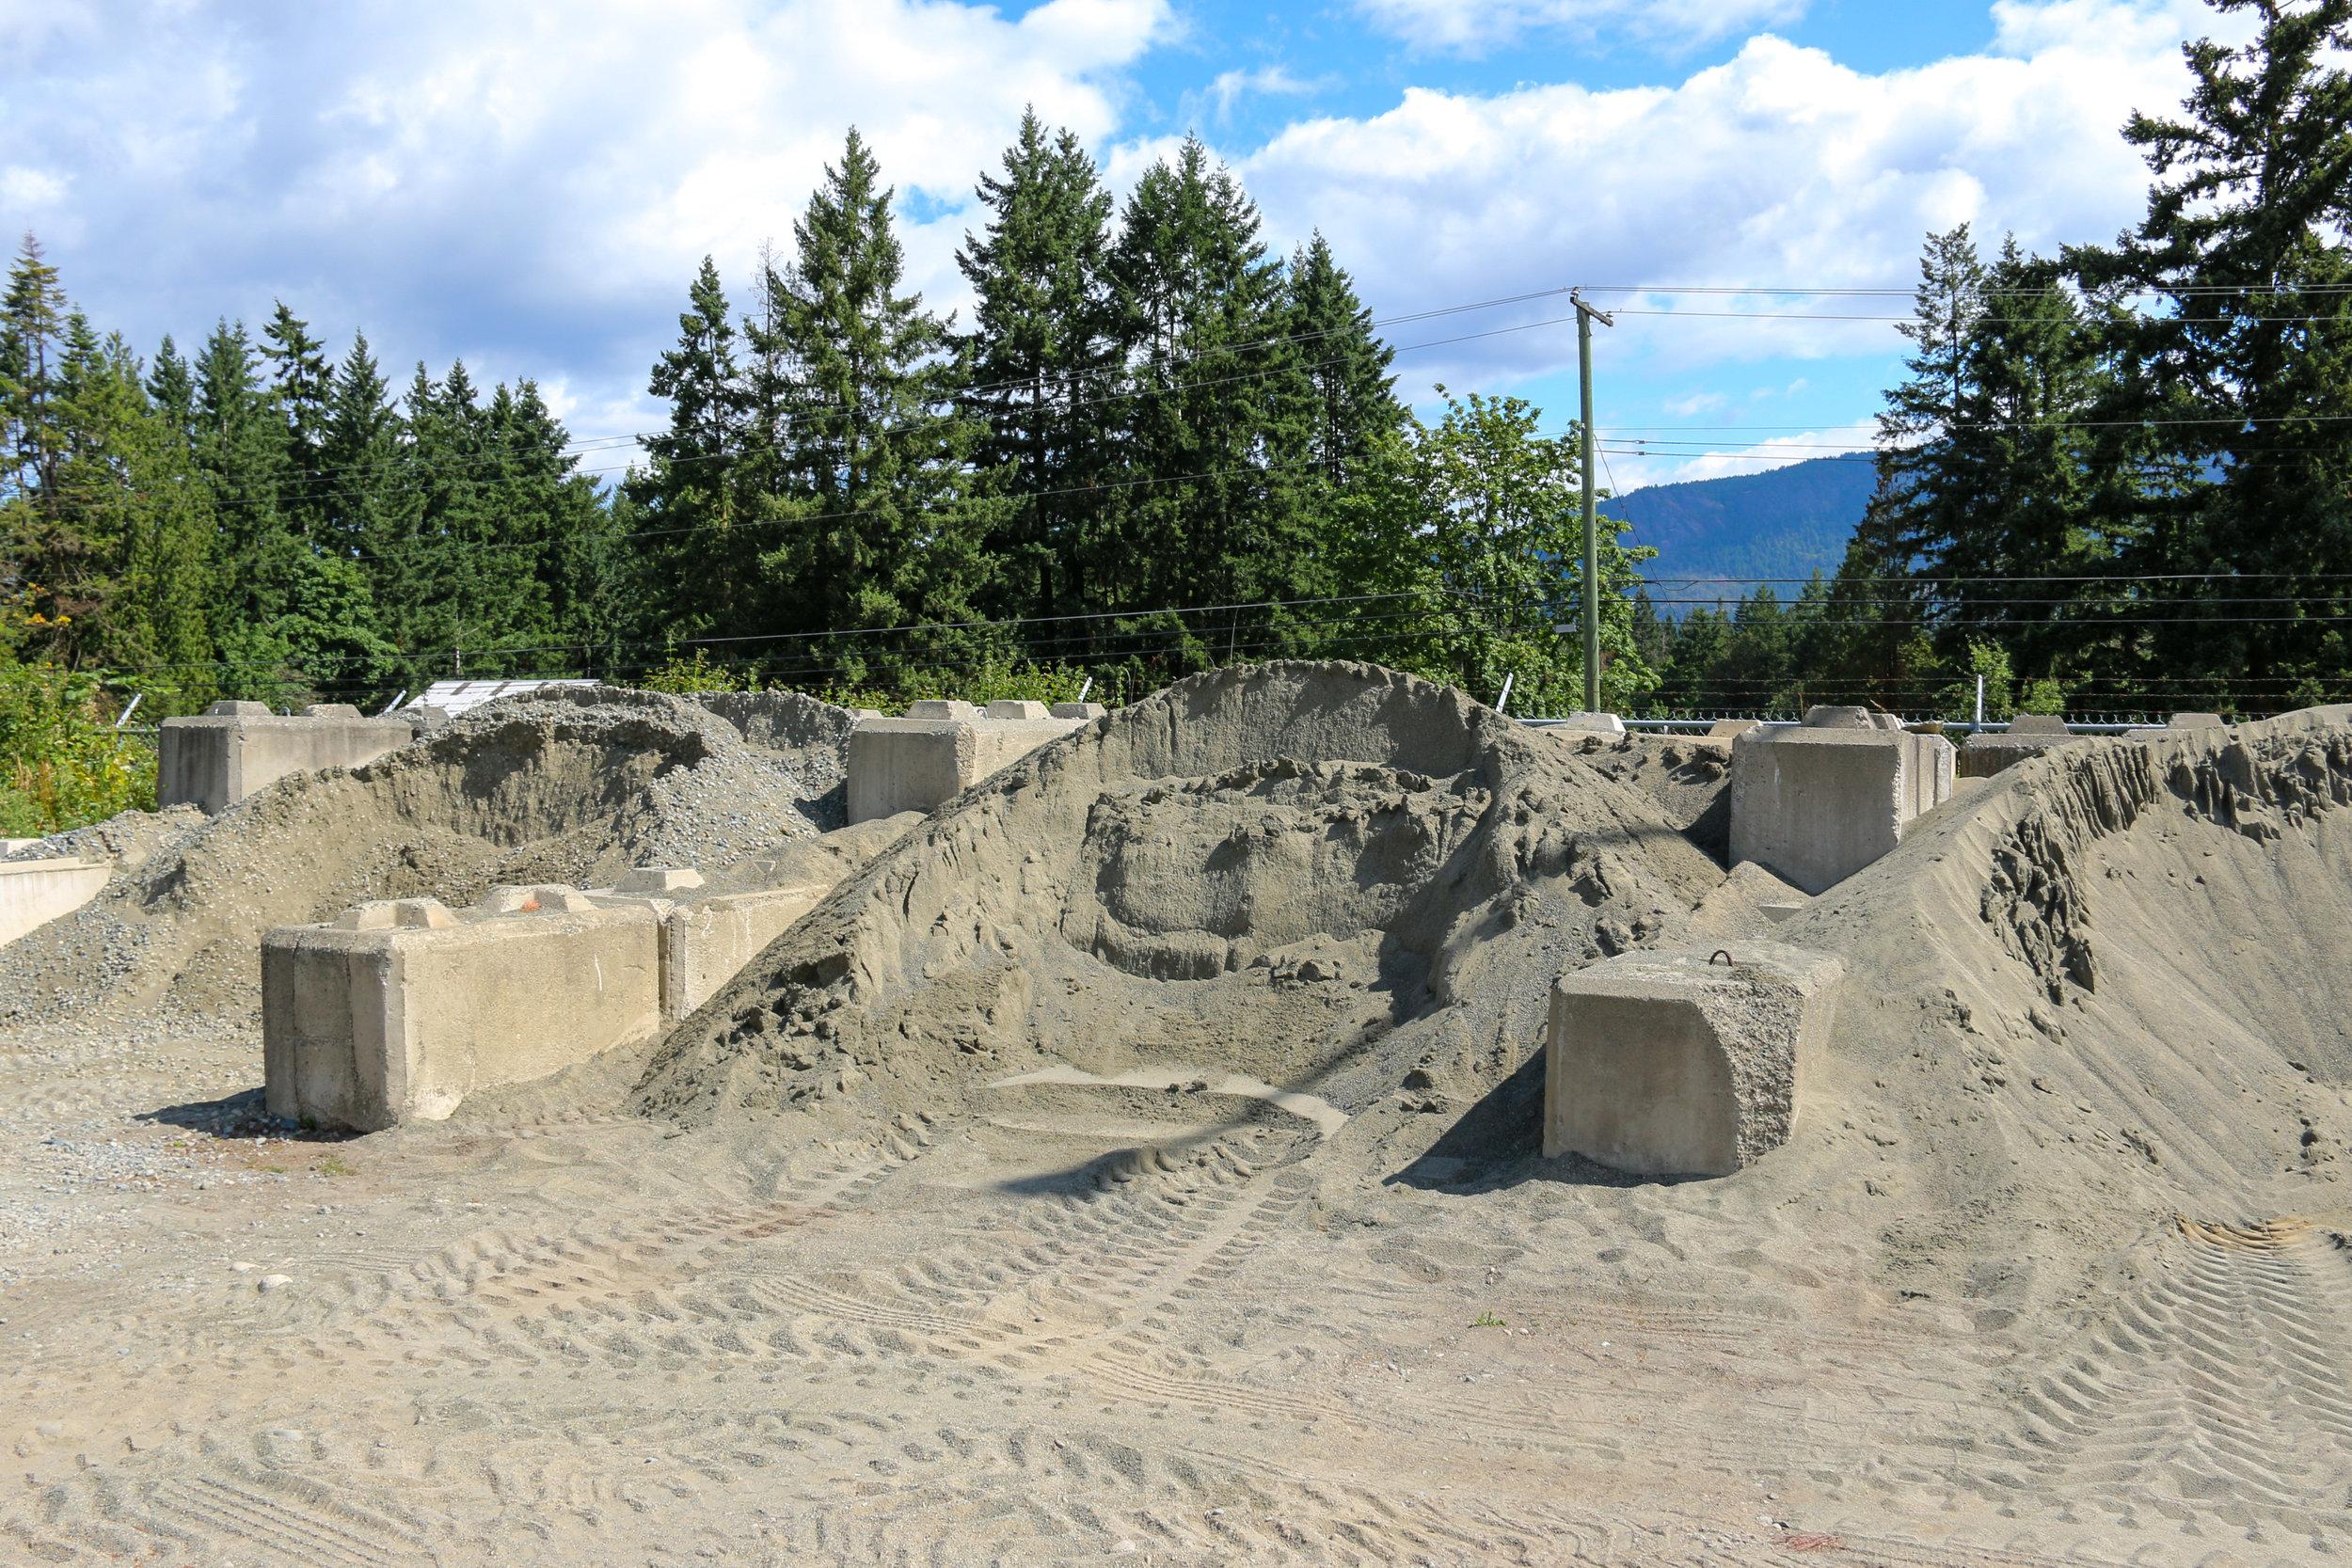 Sand Navvy Jack Hillside Stone and Garden